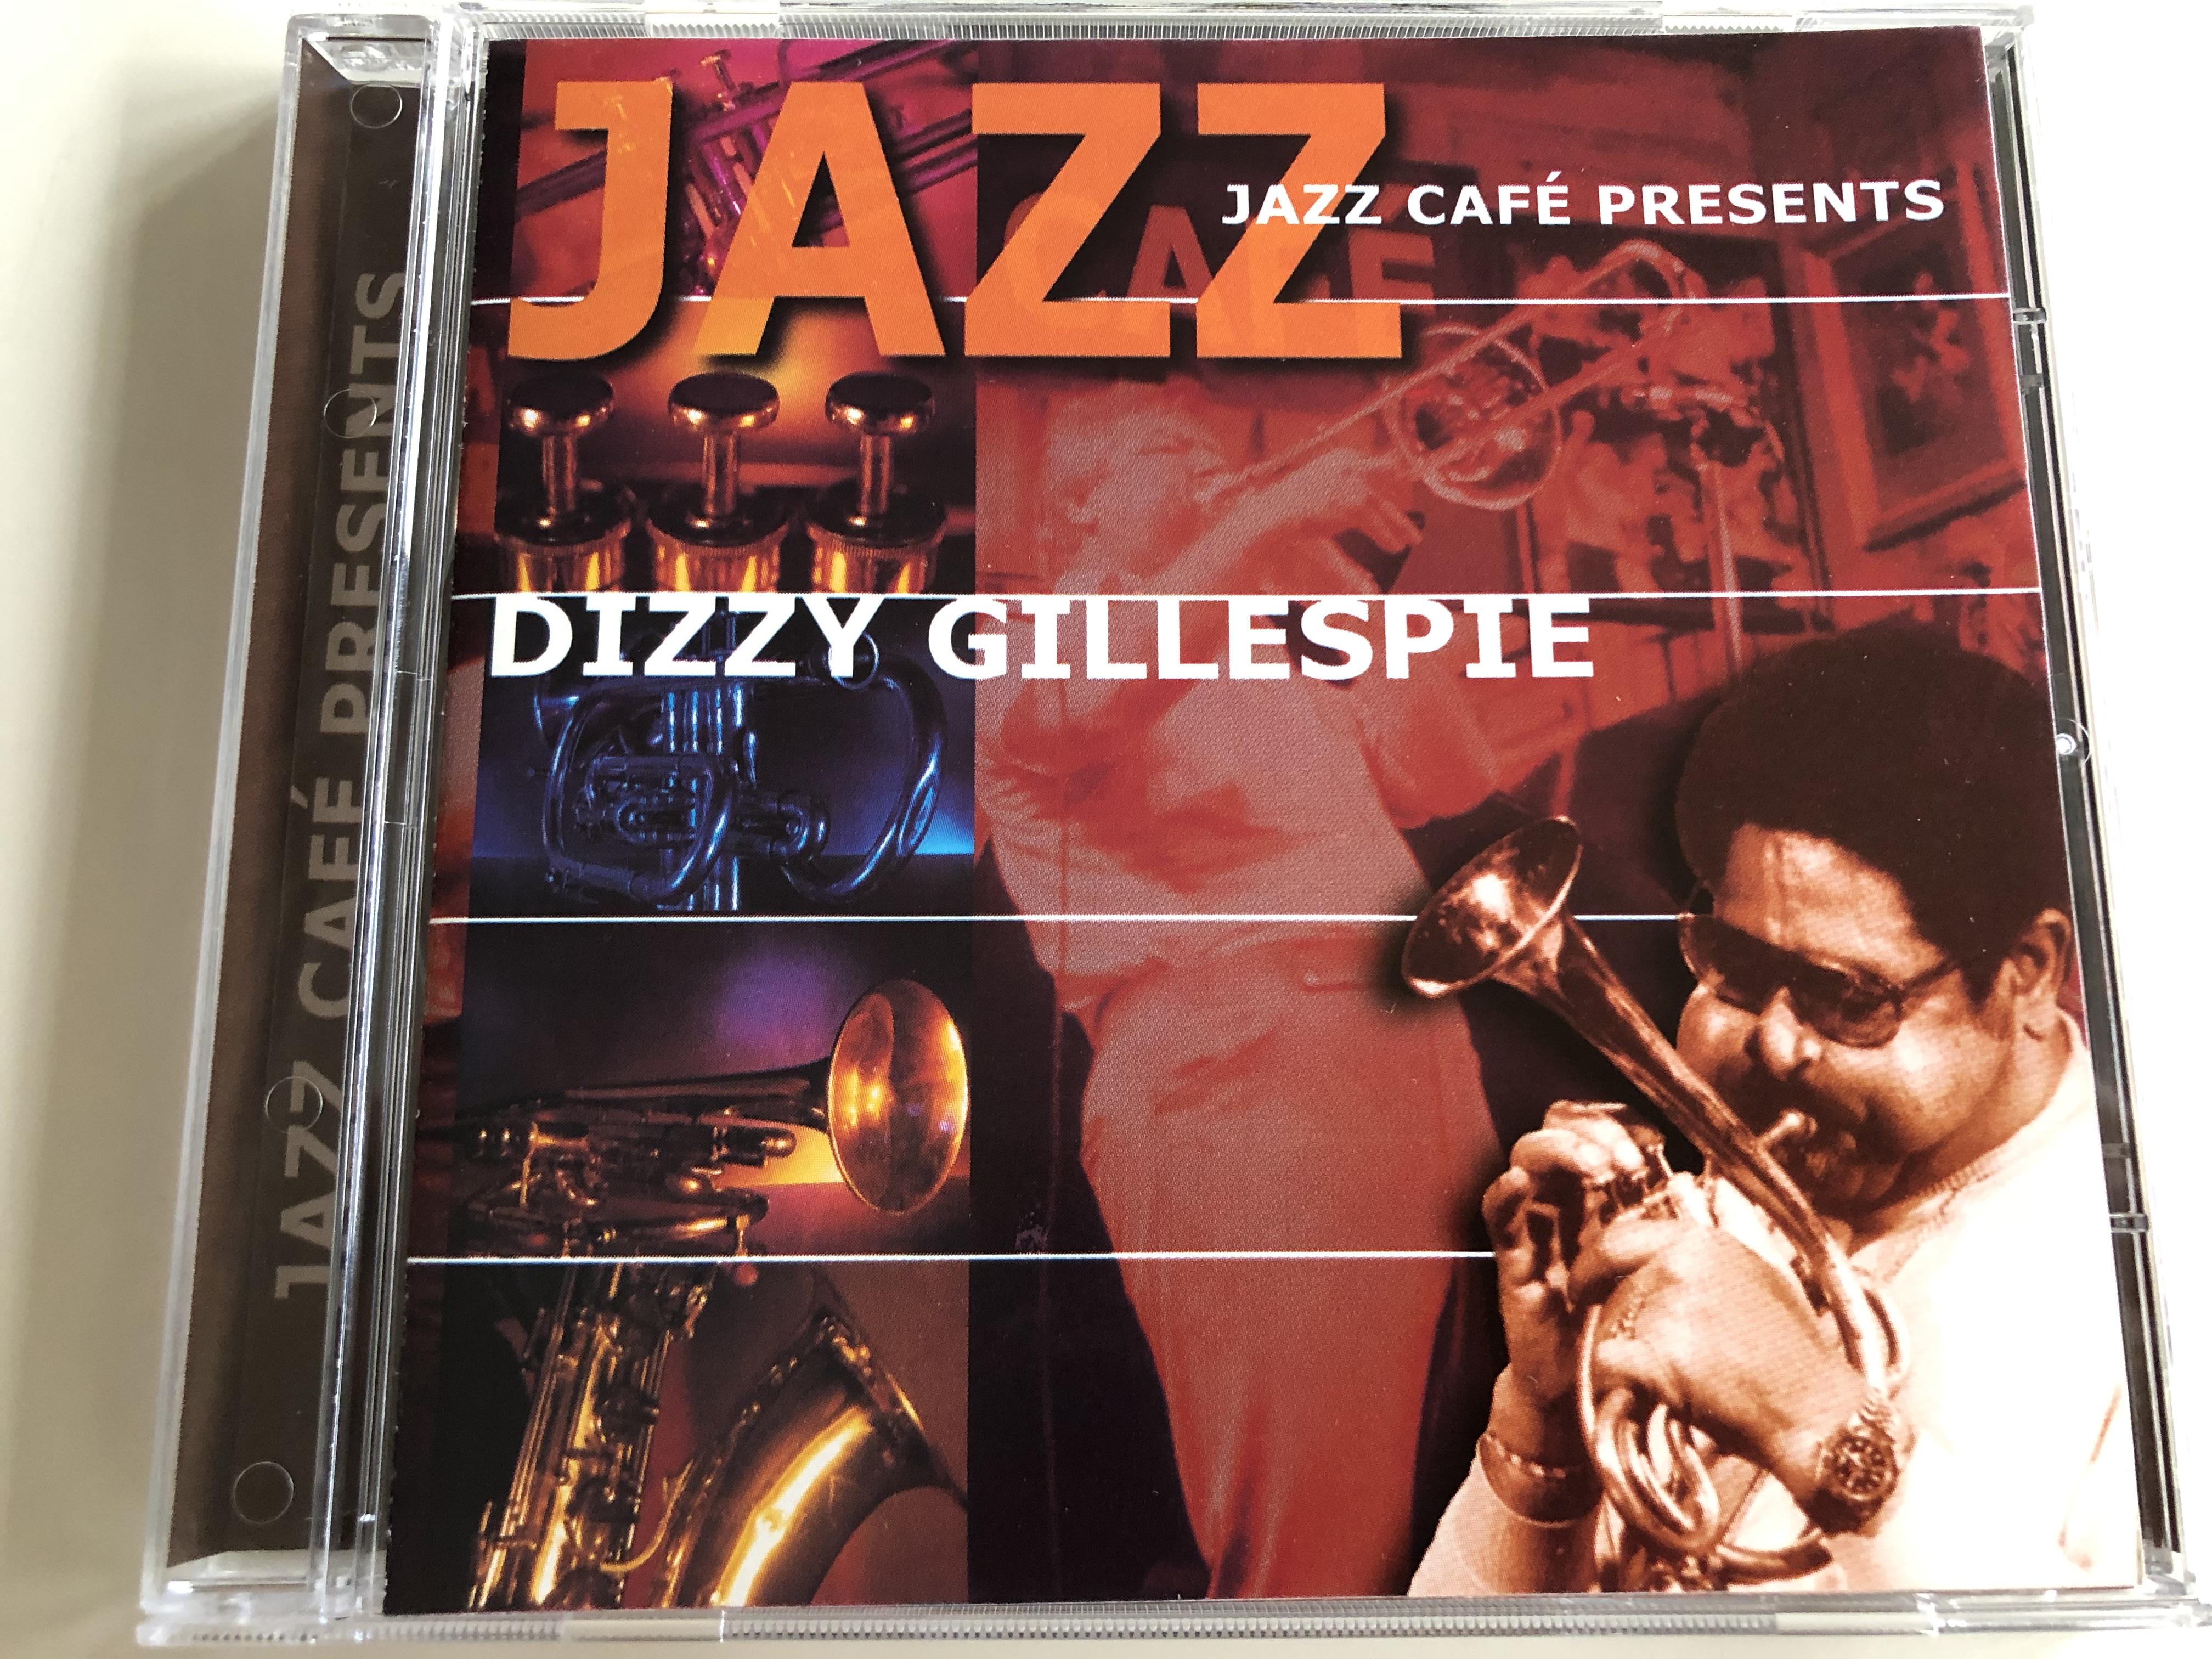 jazz-caf-presents-dizzy-gillespie-audio-cd-2001-galaxy-music-3899202-1-.jpg